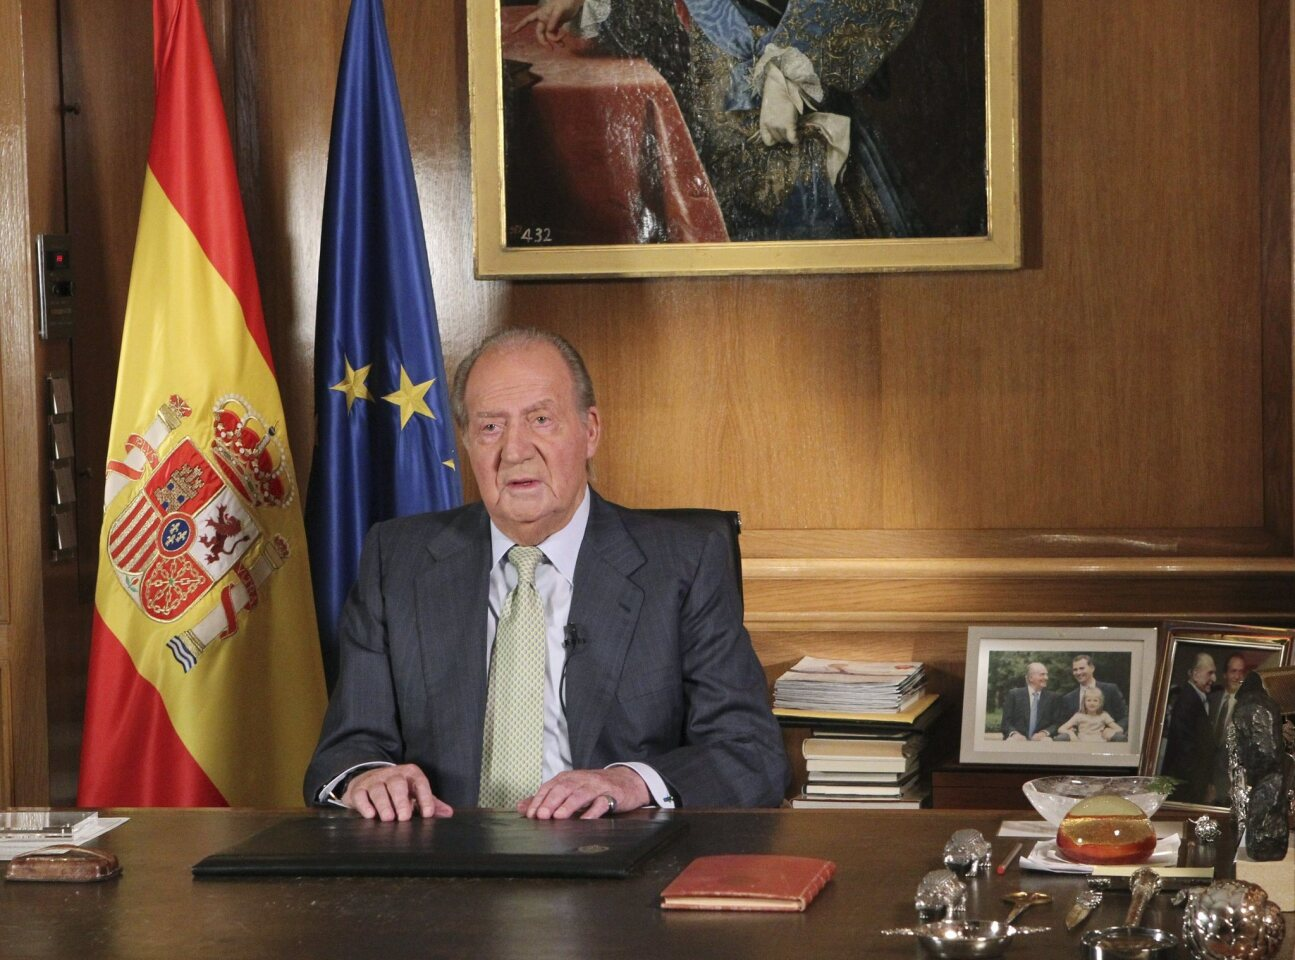 King Juan Carlos of Spain addresses citizens